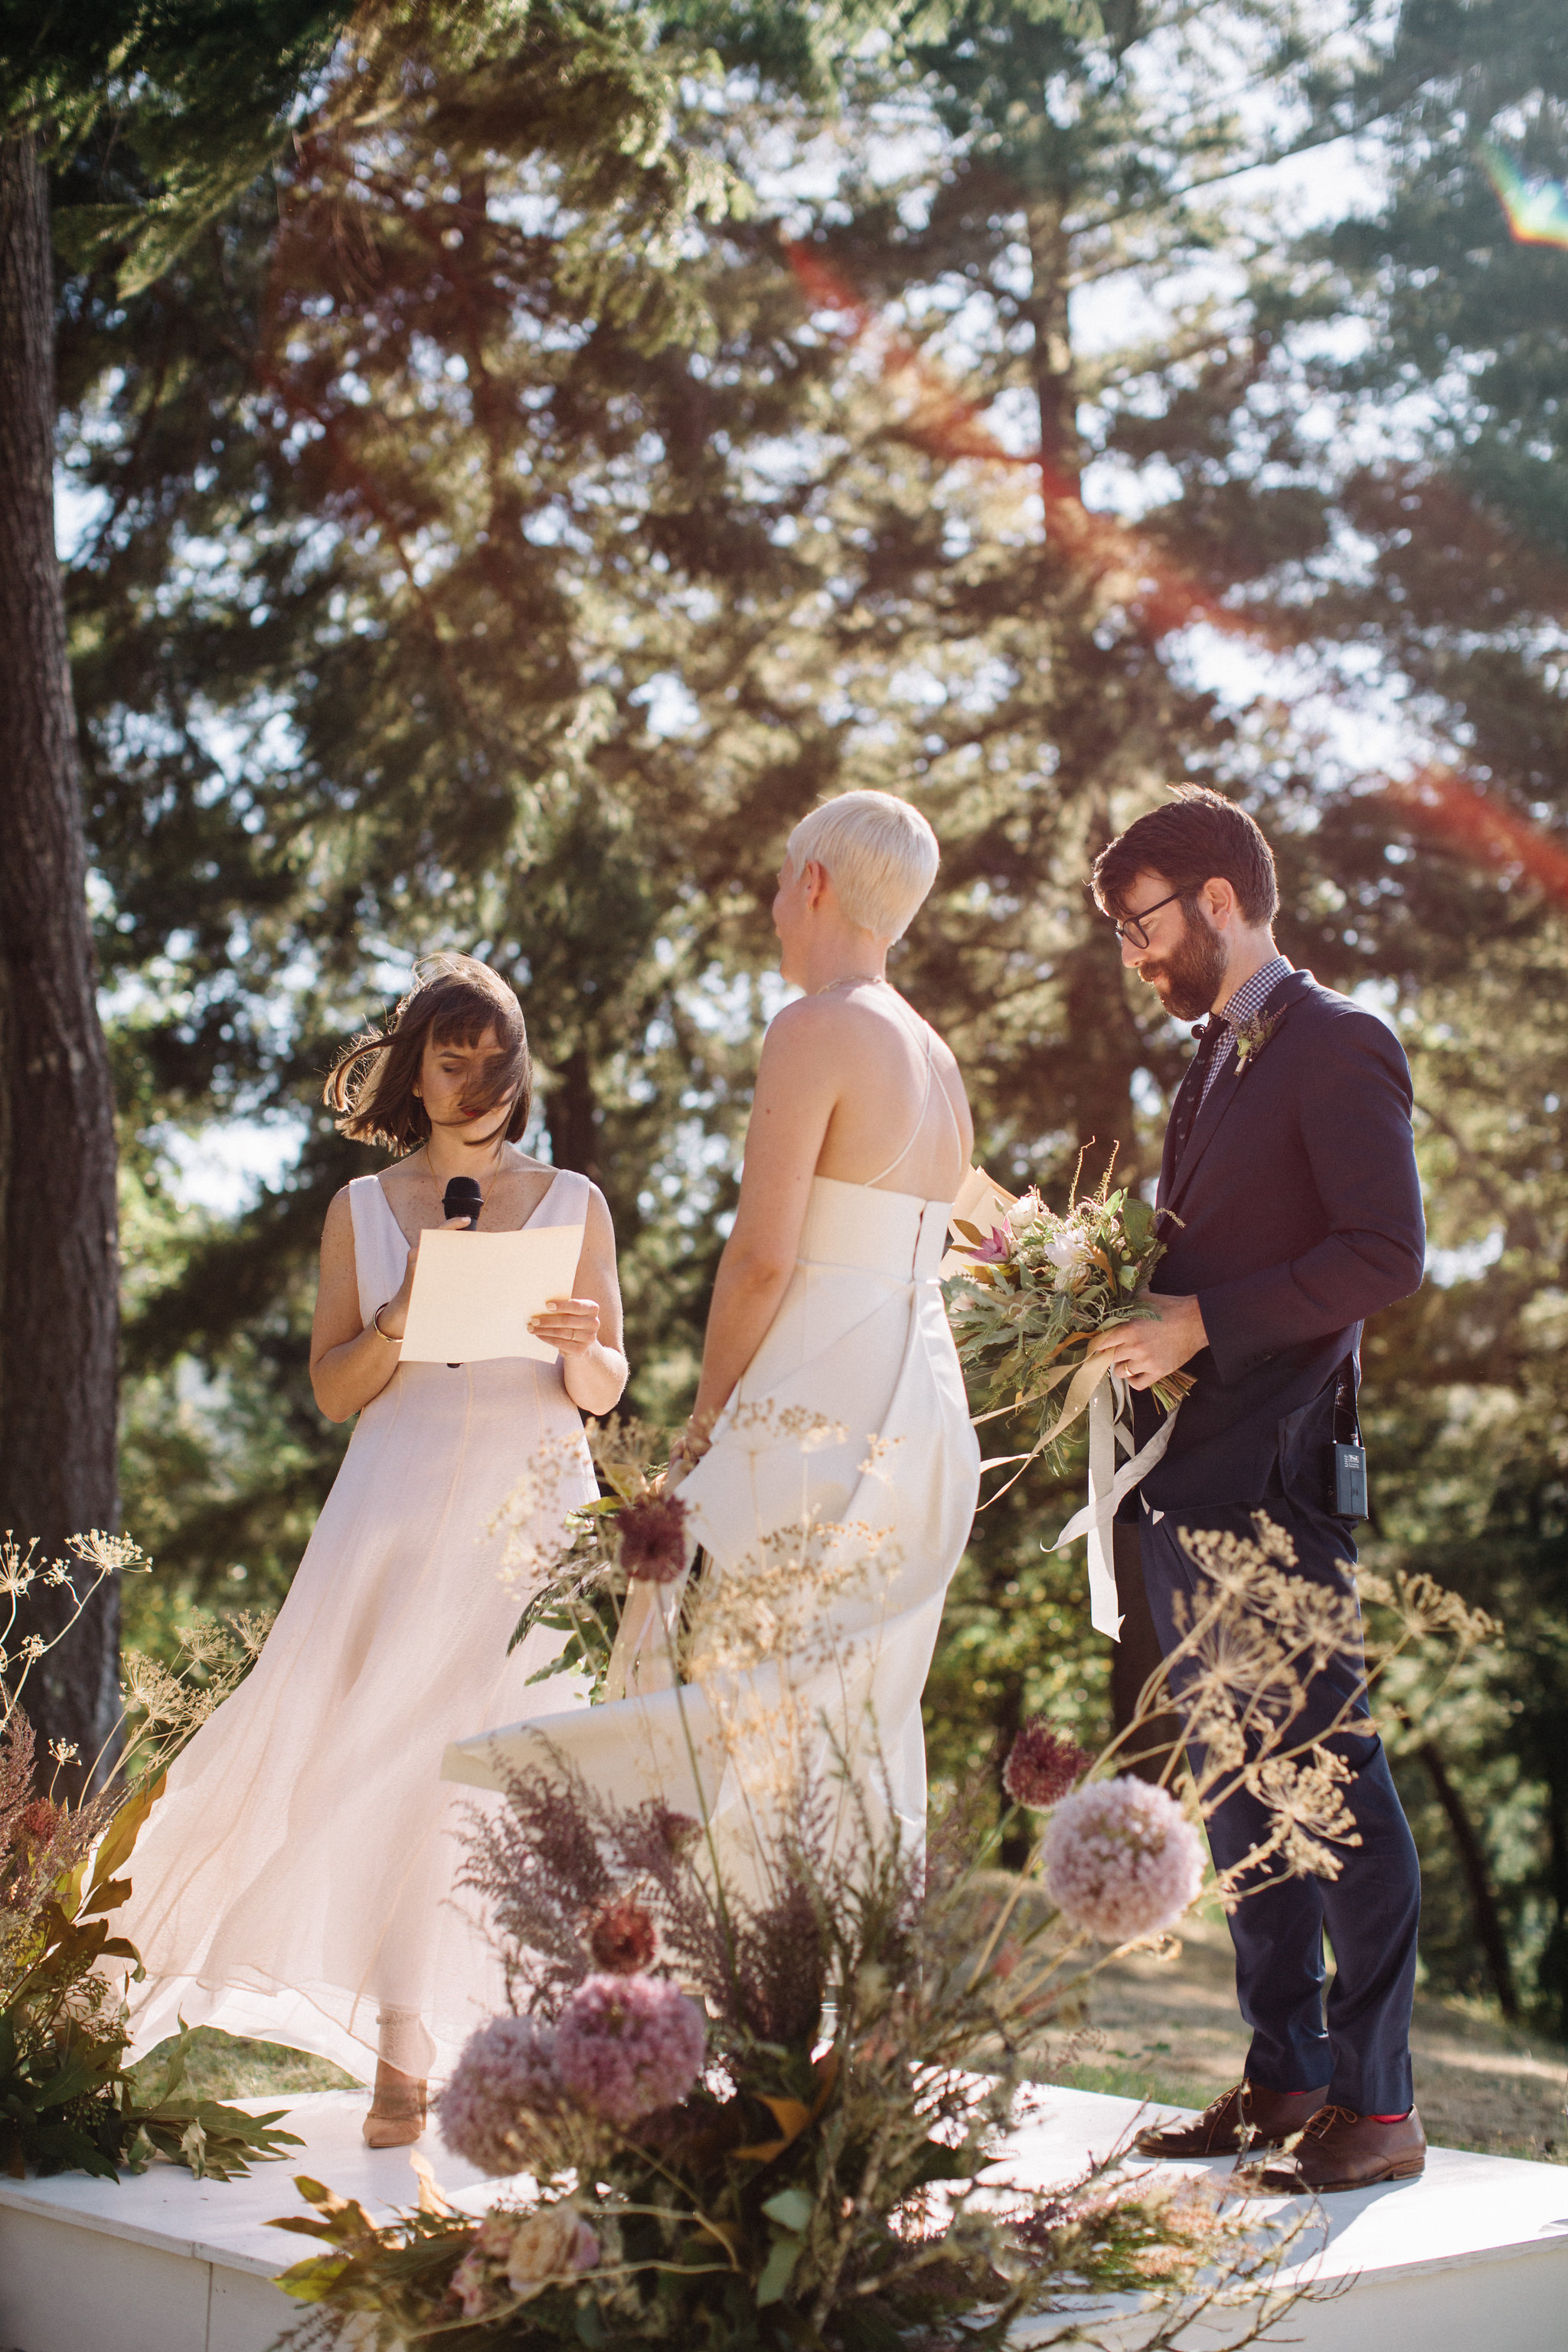 20170708_Brook+Evans_wedding_highres-285.jpg